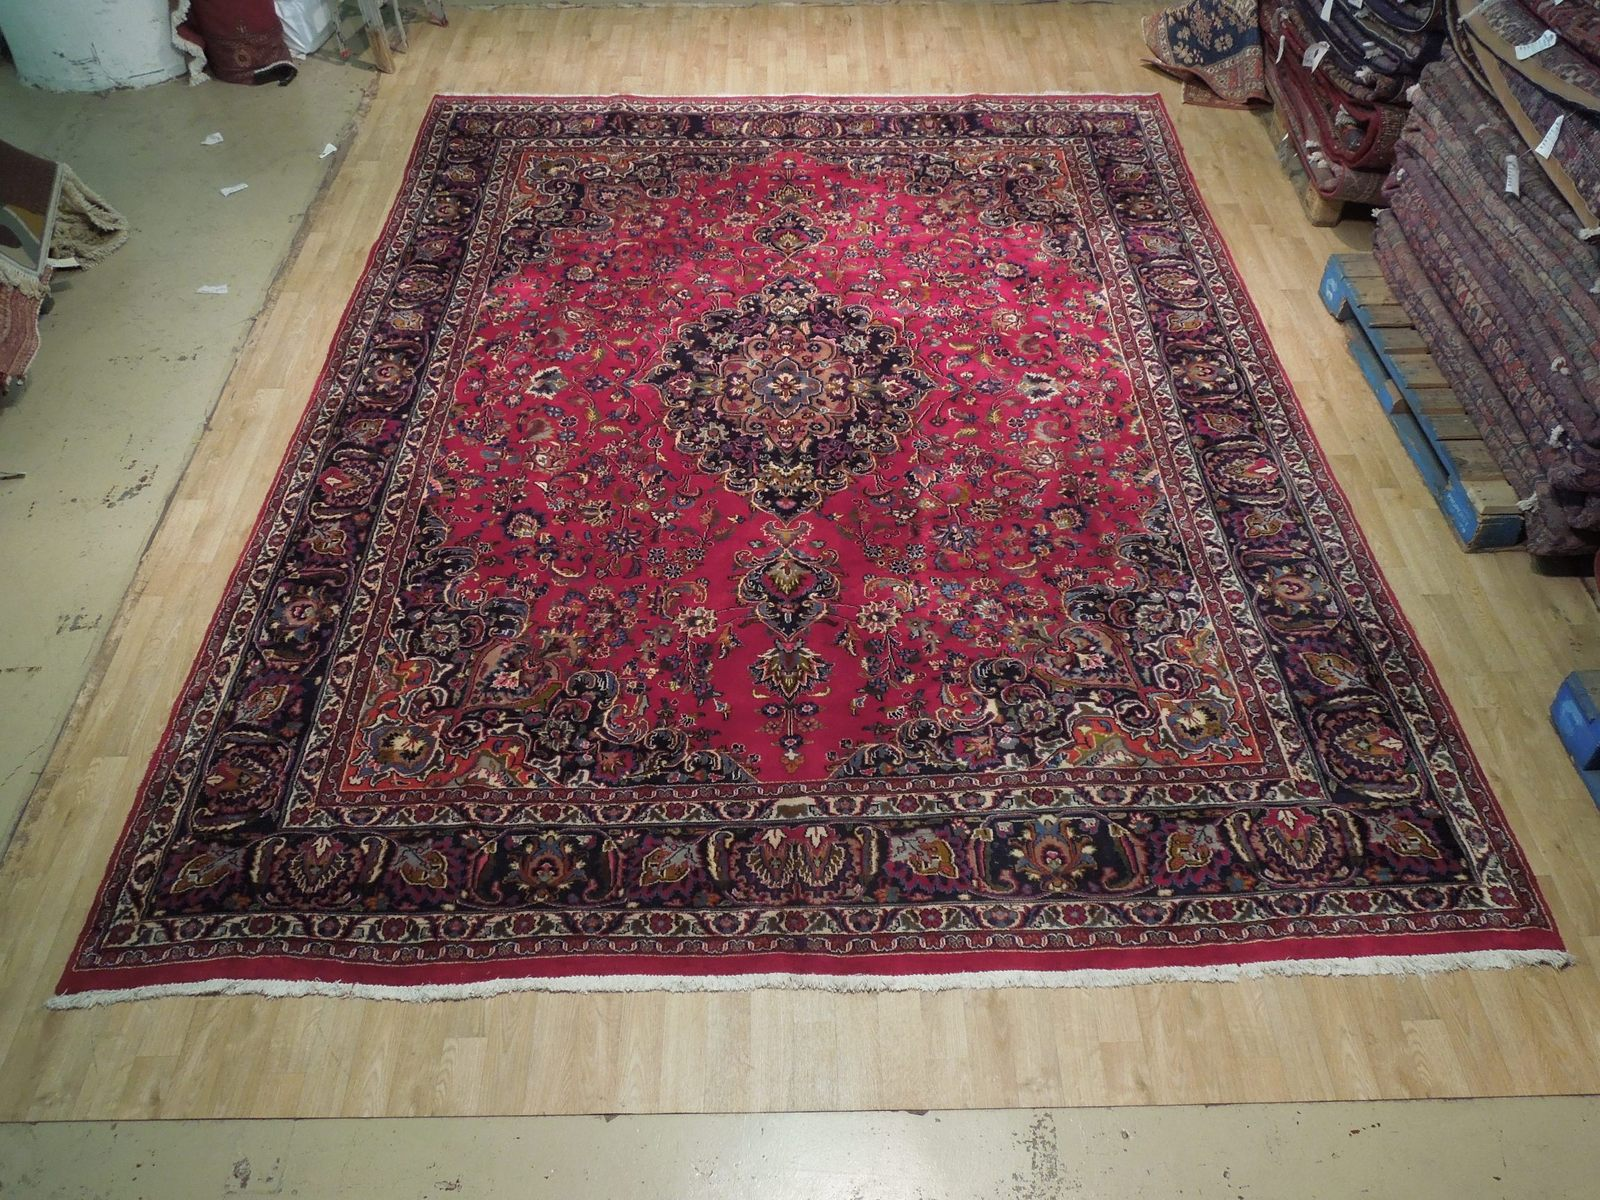 Red Wool Rug 10' x 12' Scarlet Vivid Original Traditional Persian Handmade Rug image 4